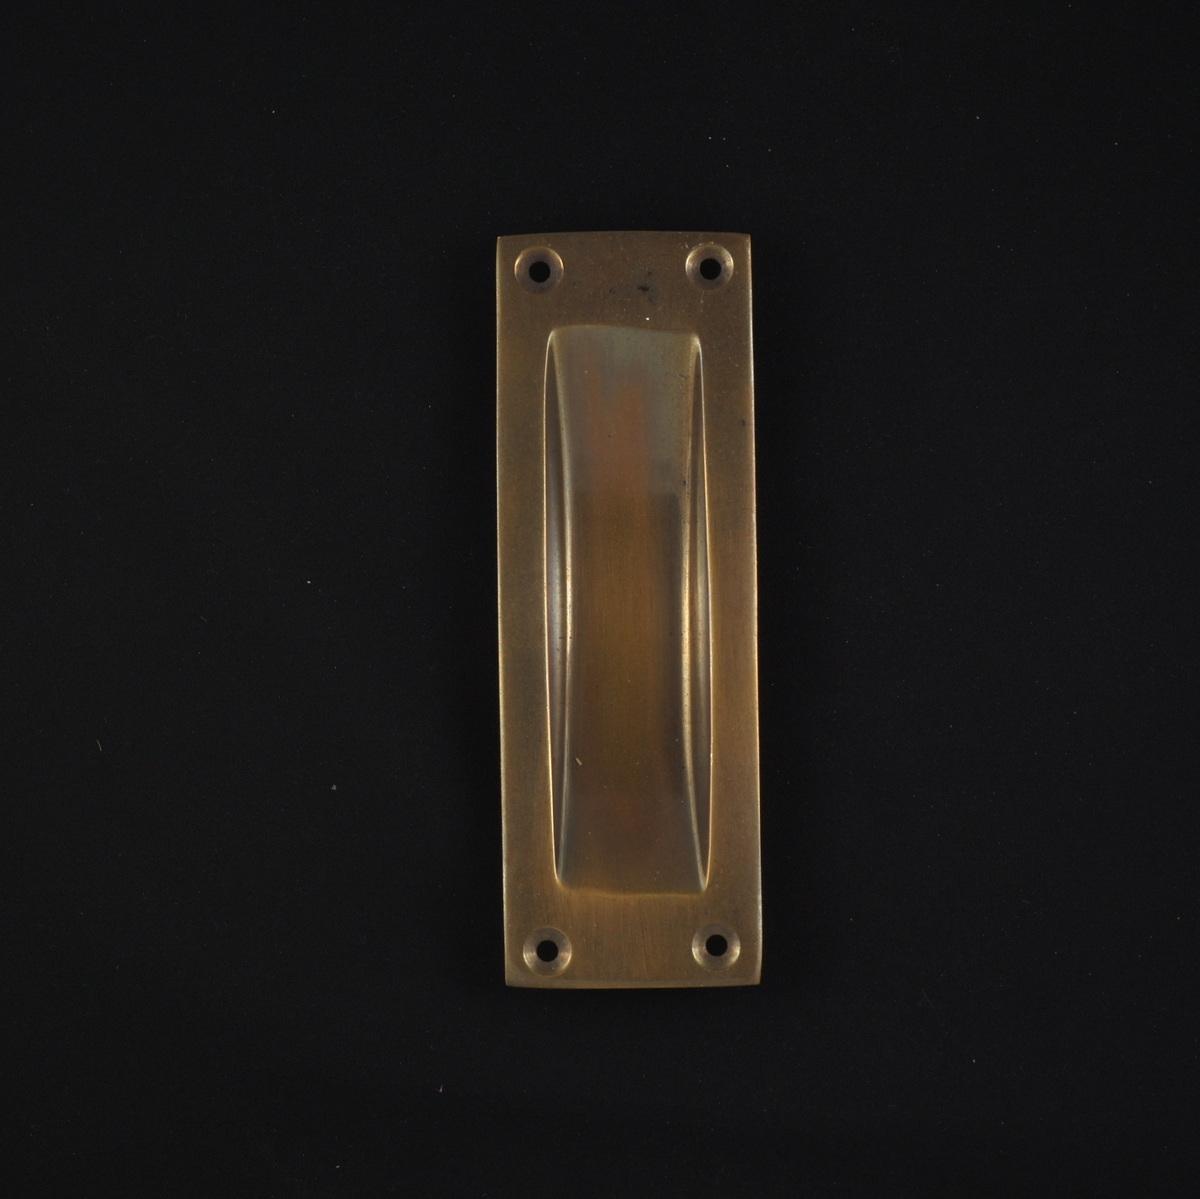 325.0008.45 Schiebetürmuschel - antike Türmuschel